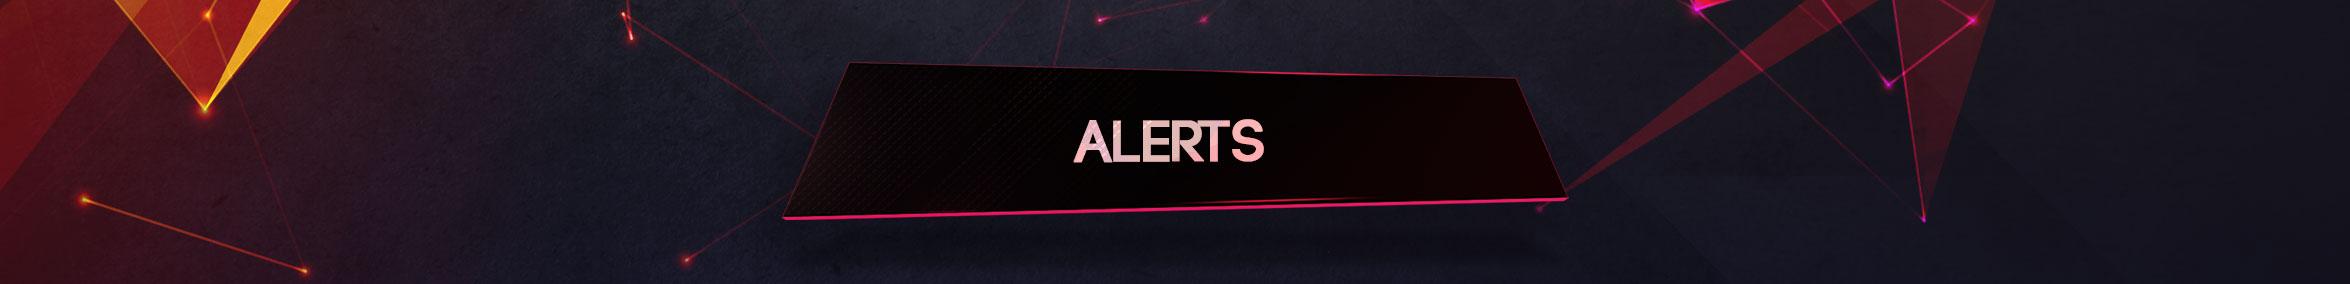 twitch alerts